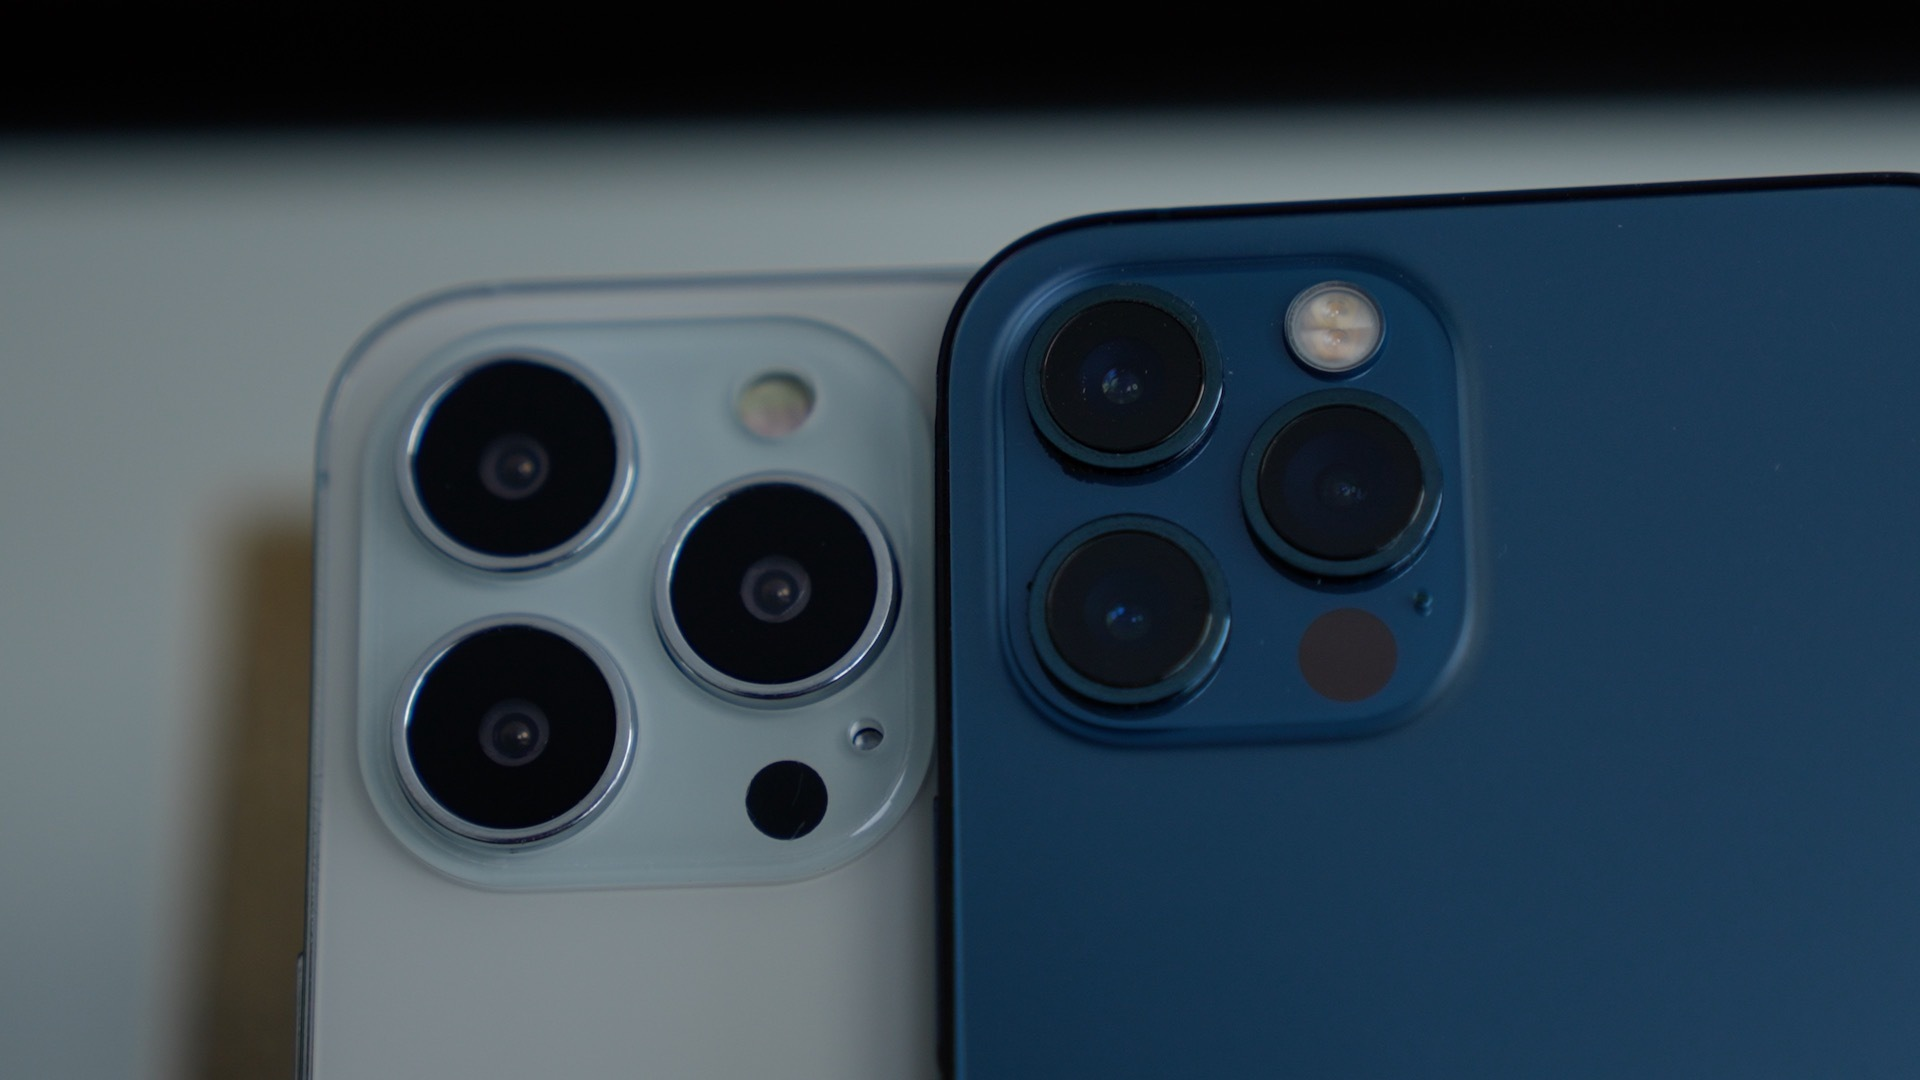 iphone 12 pro iphone 13 pro